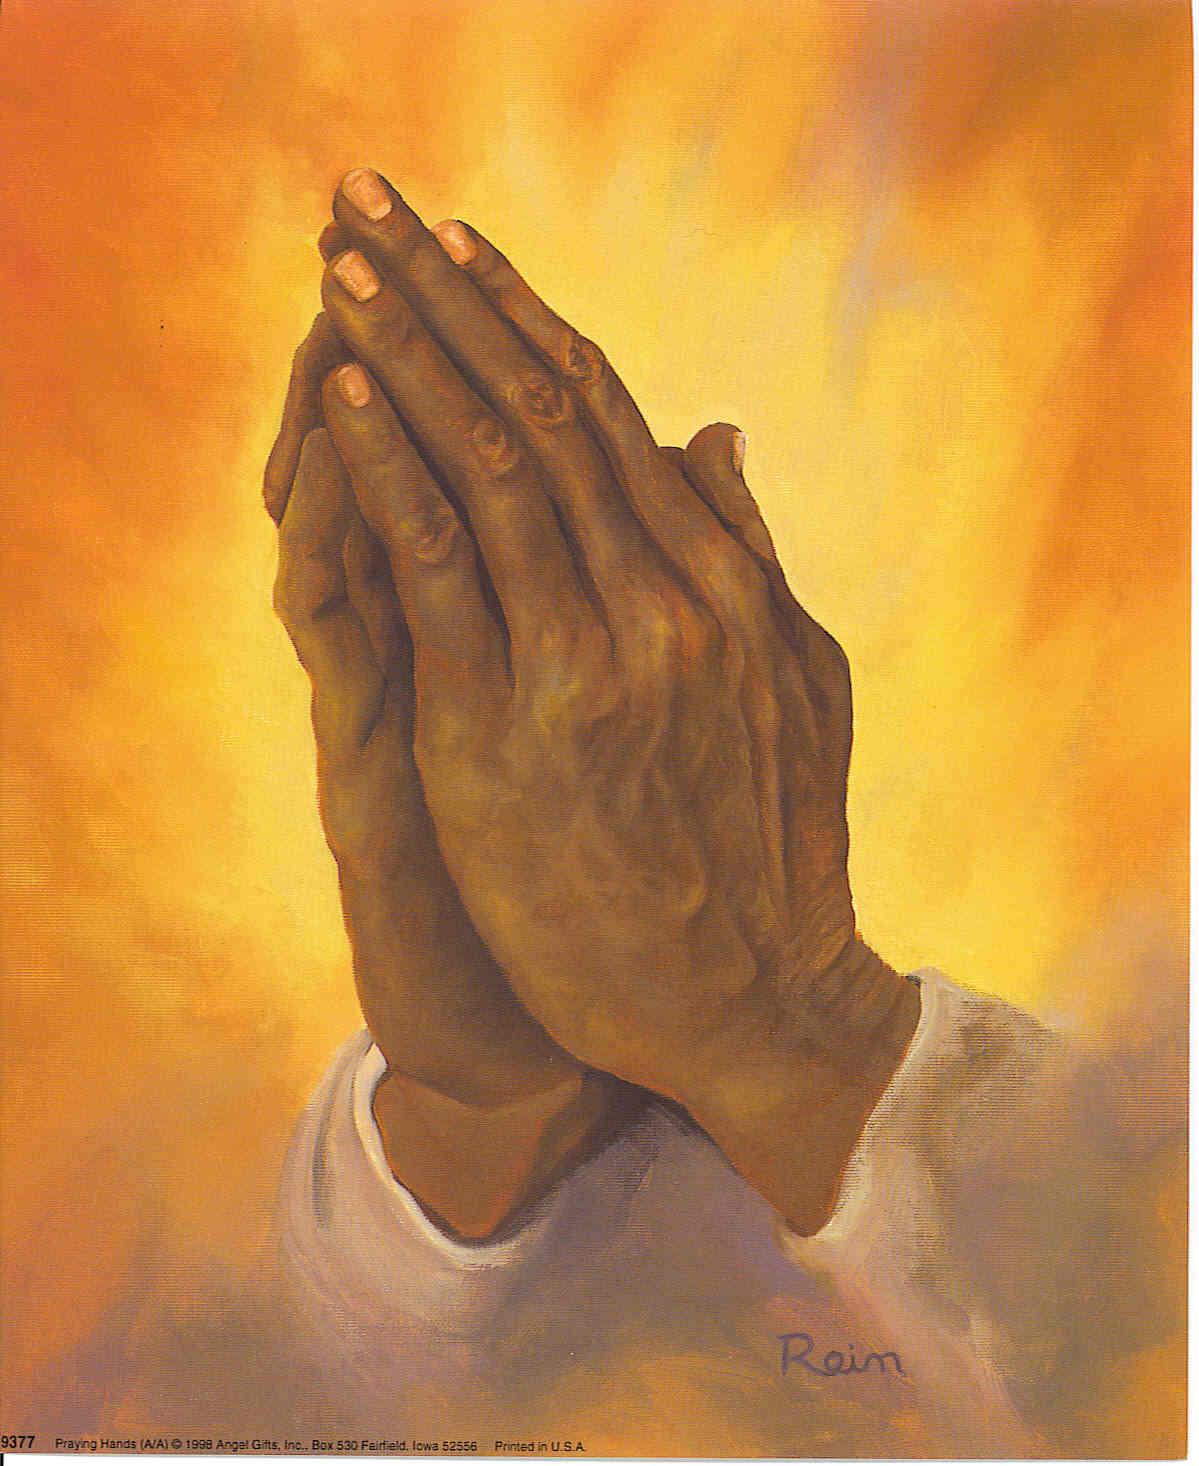 http://4.bp.blogspot.com/-XkkhciCVYU4/TWBXHA9R6GI/AAAAAAAAECE/8pSpy_Z3i_8/s1600/Praying+Hands.jpg